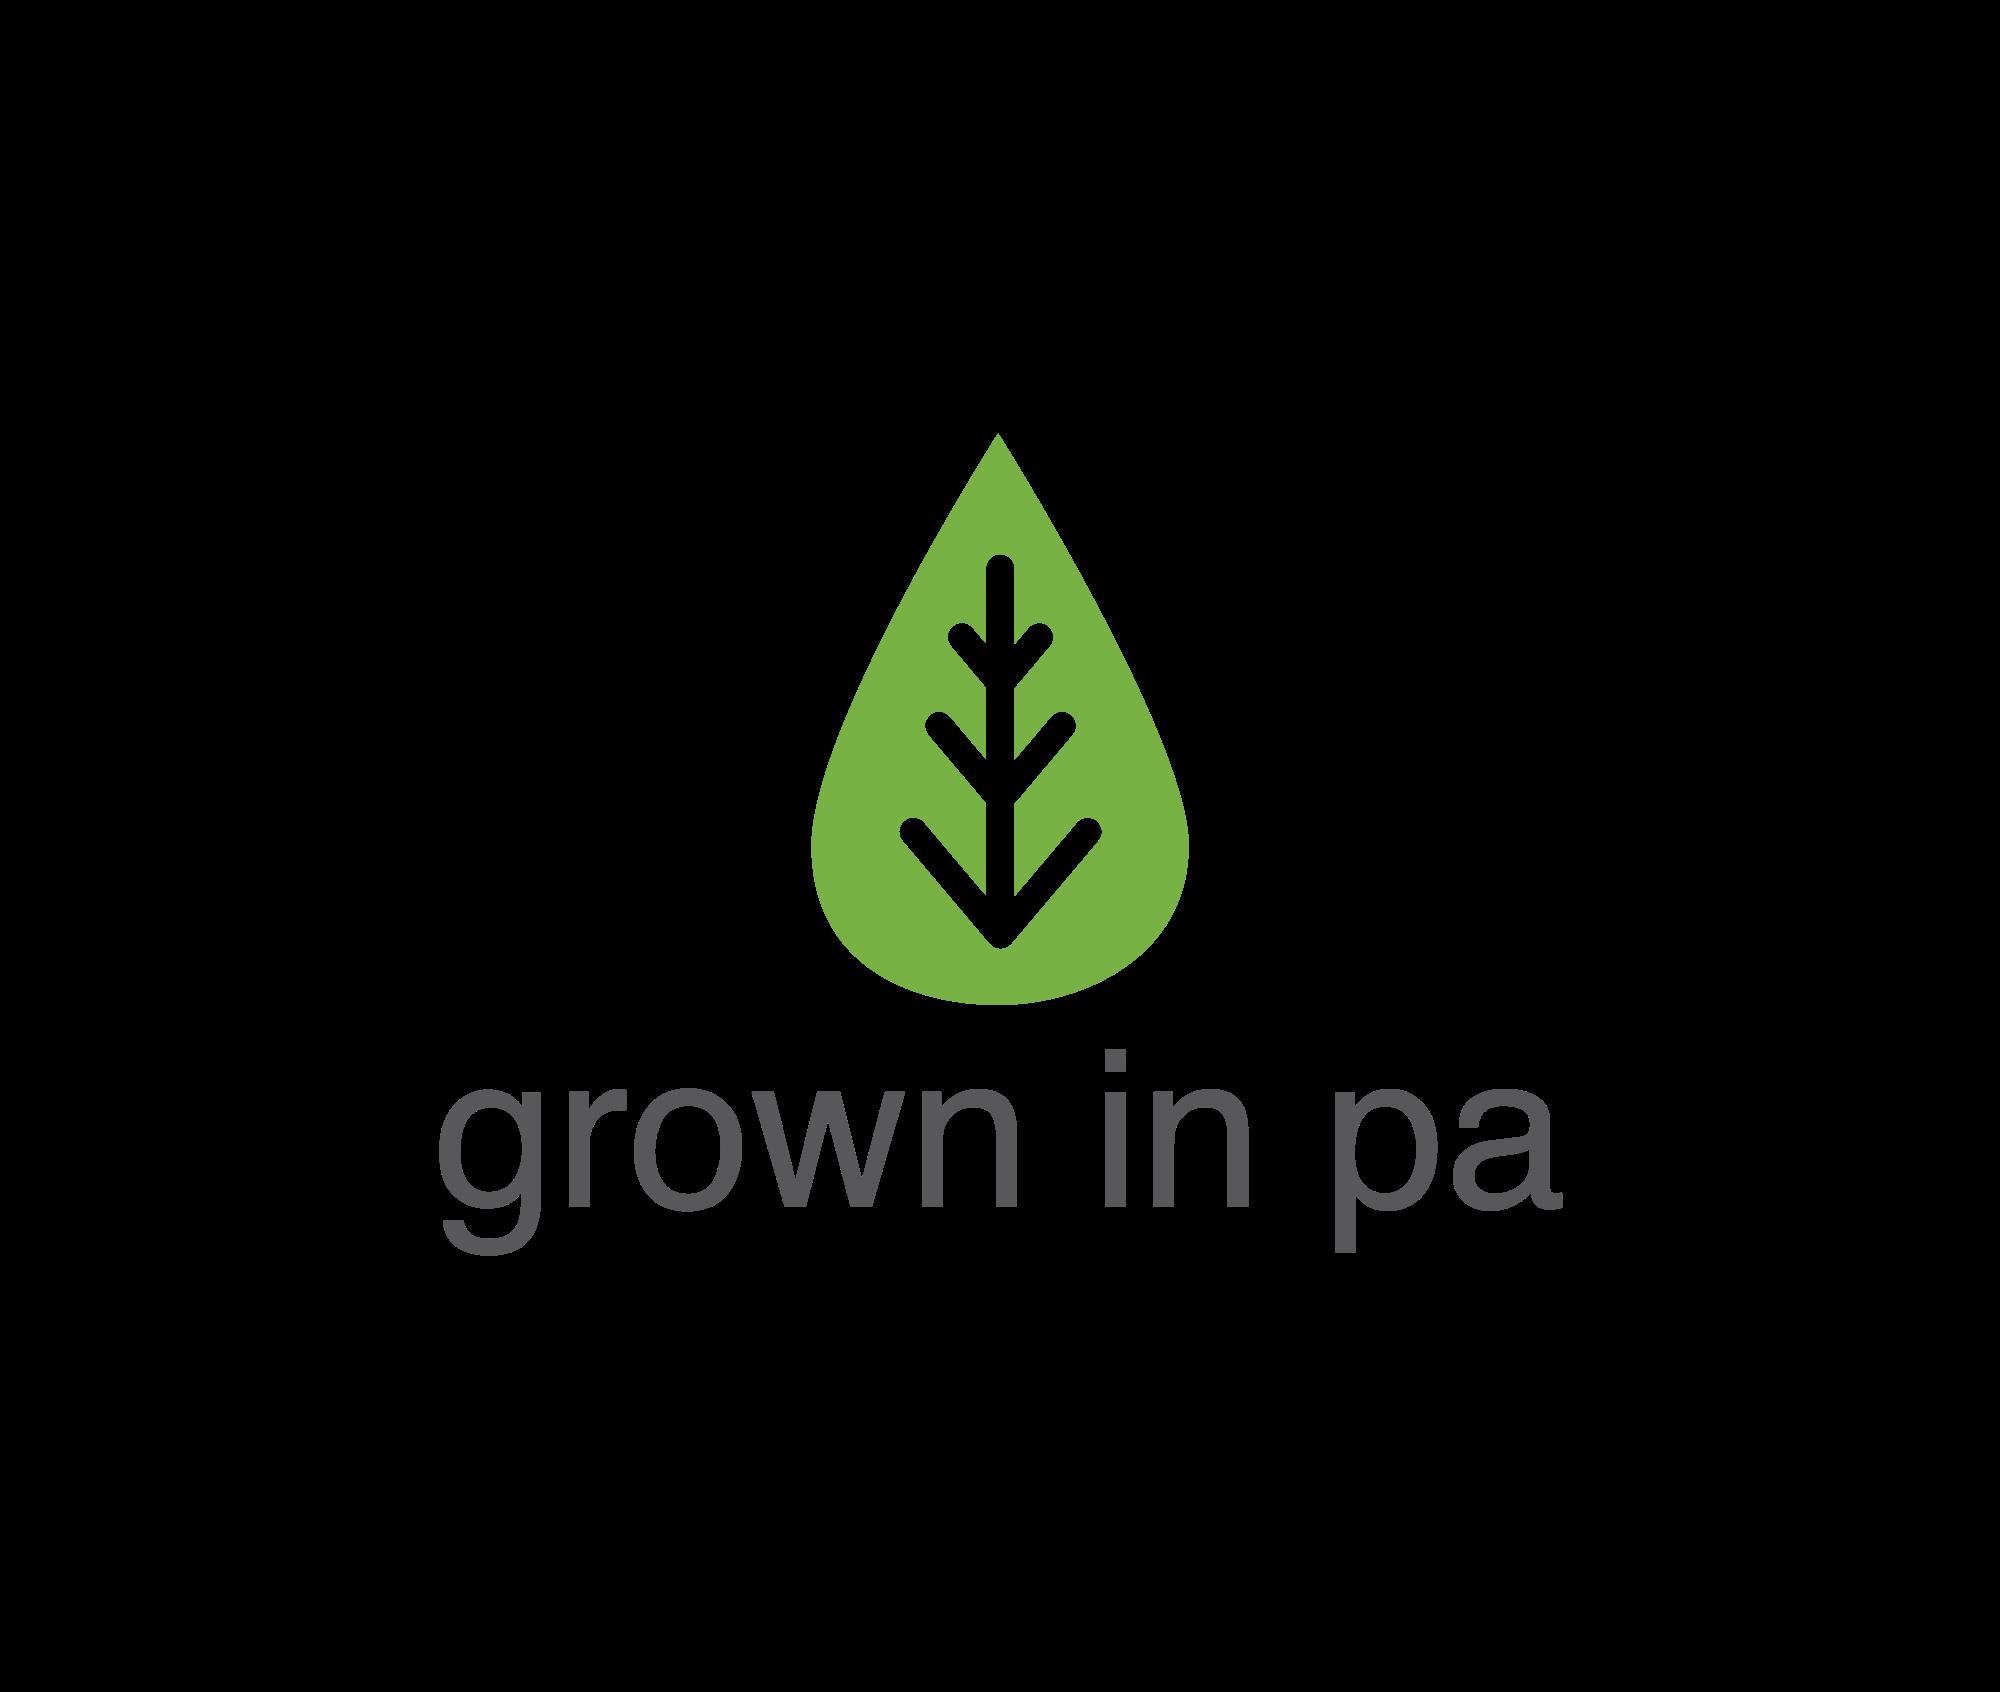 grown-in-pa-badge-snowgreens.png